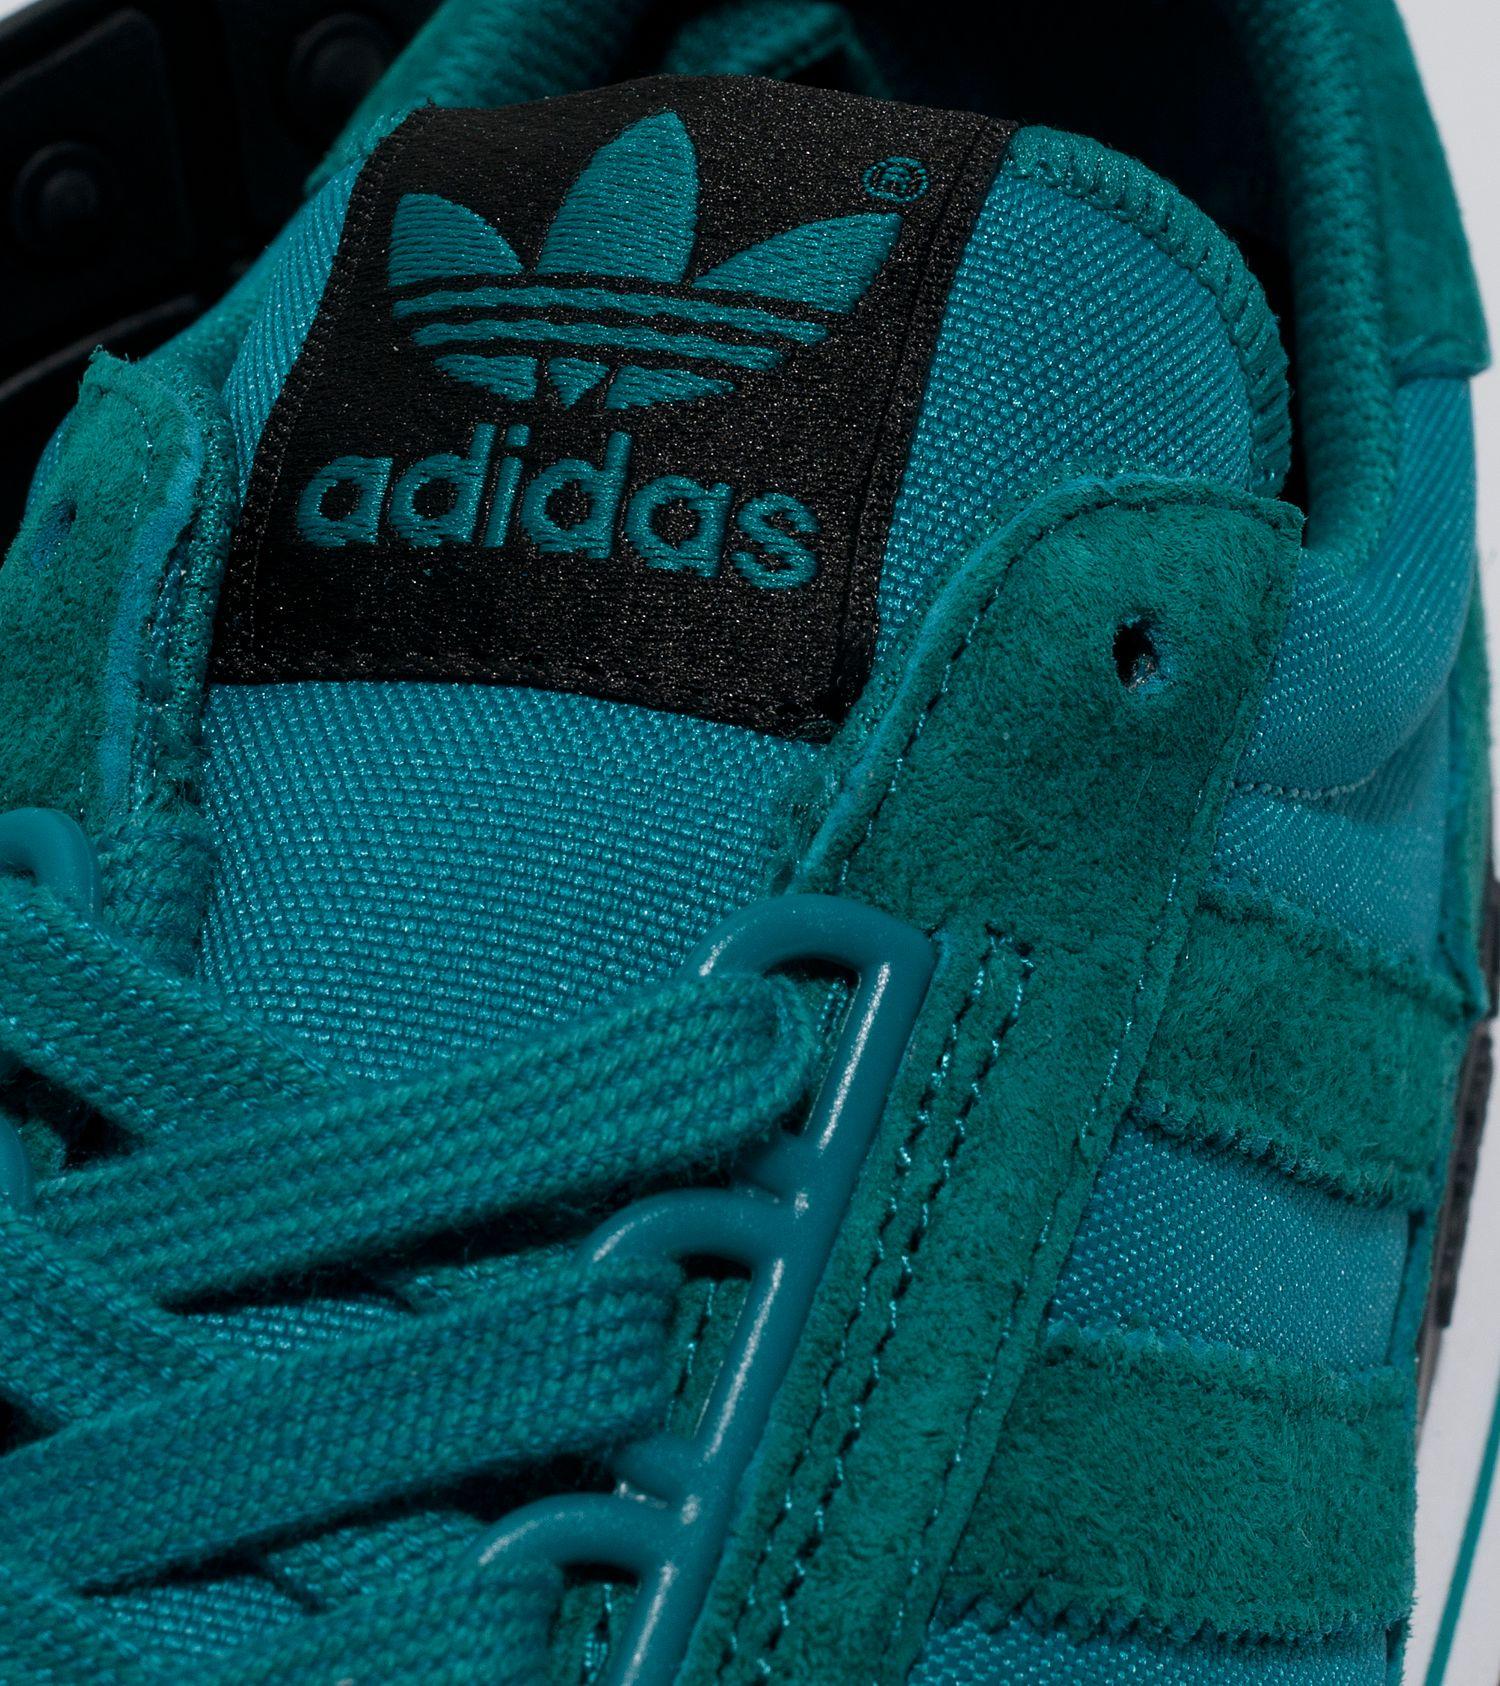 incluir riega la flor Mareo  adidas ZX500 OG - Green - Black - SneakerNews.com